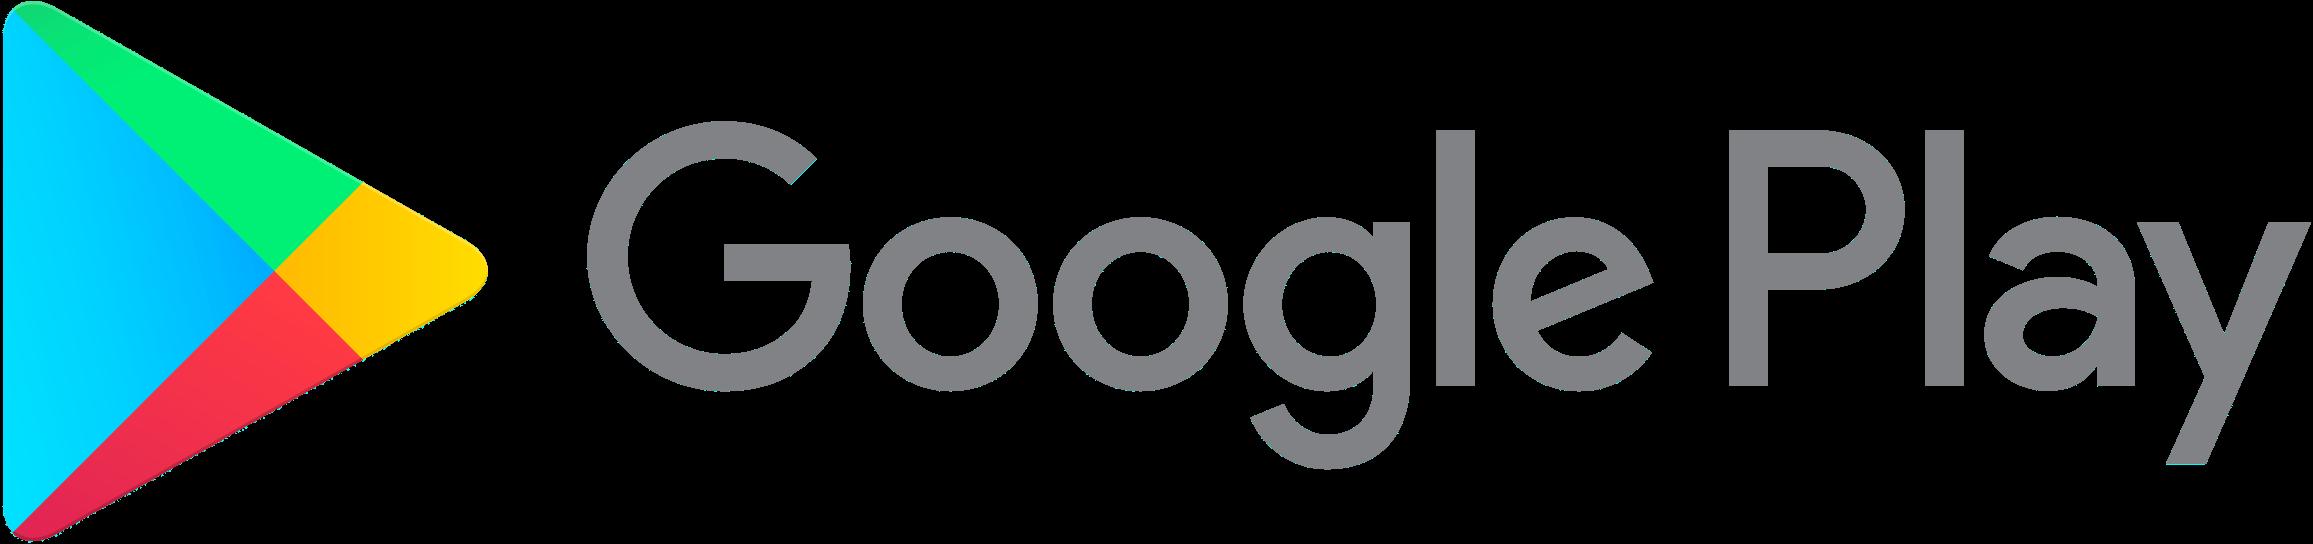 Google Play Logo.wine